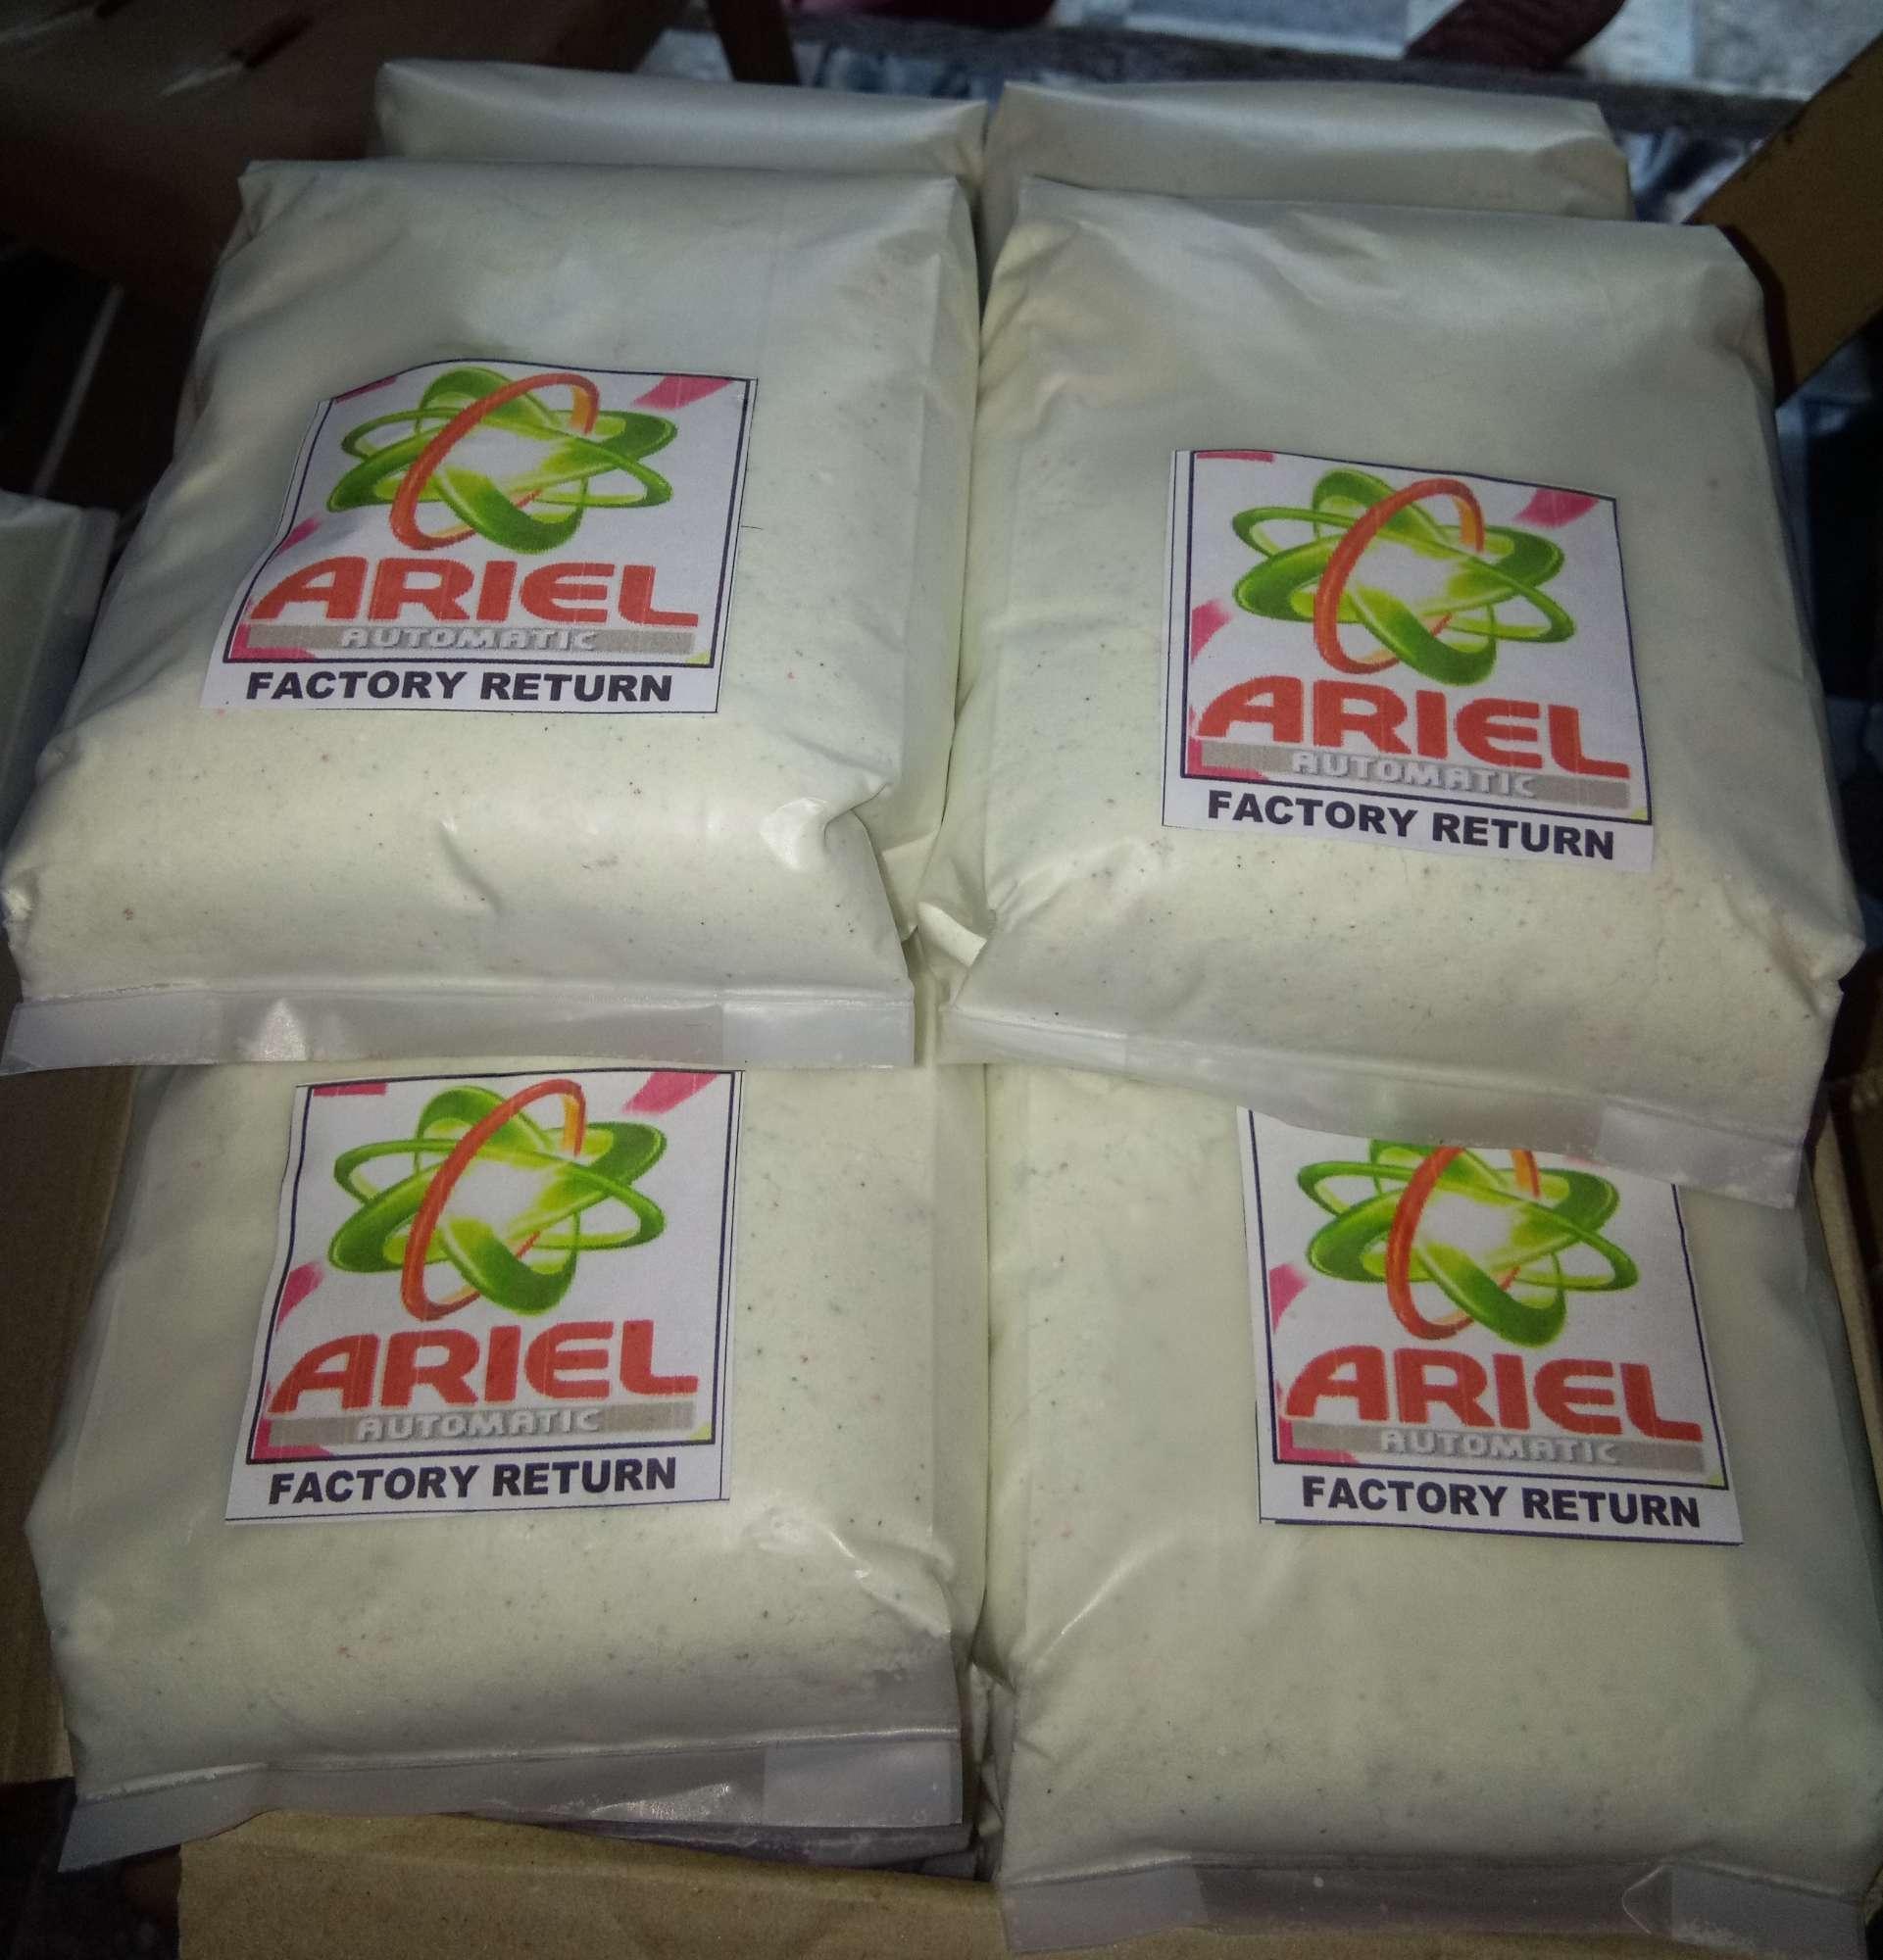 1kilo Ariel Factory Return 11 11 price Limited offer